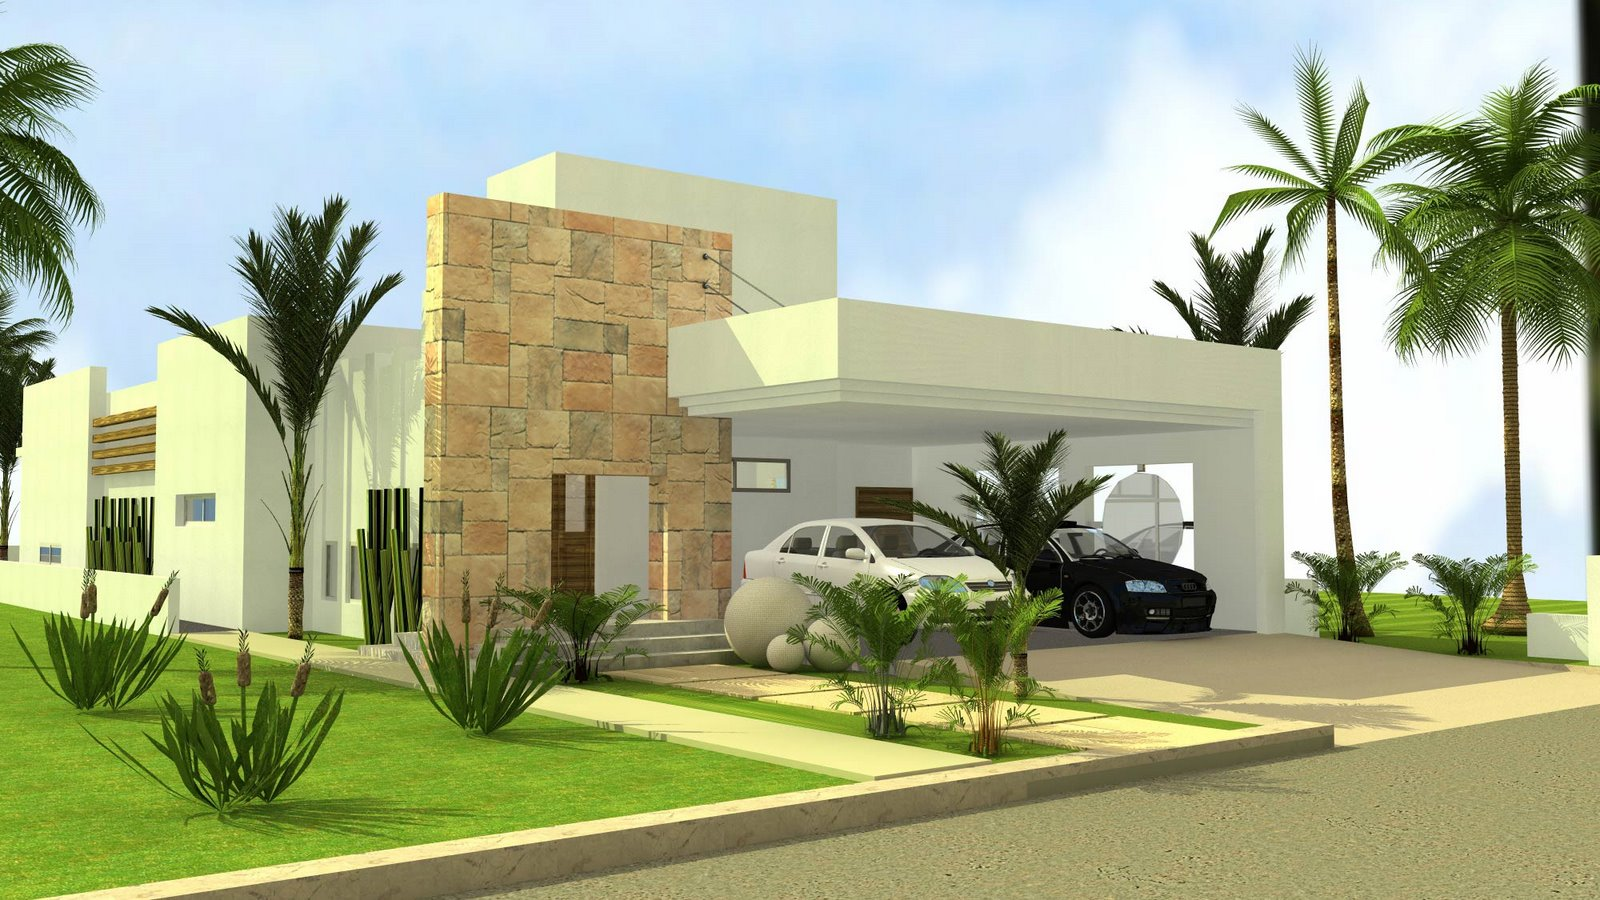 European modern home design home design and style for European modern house plans